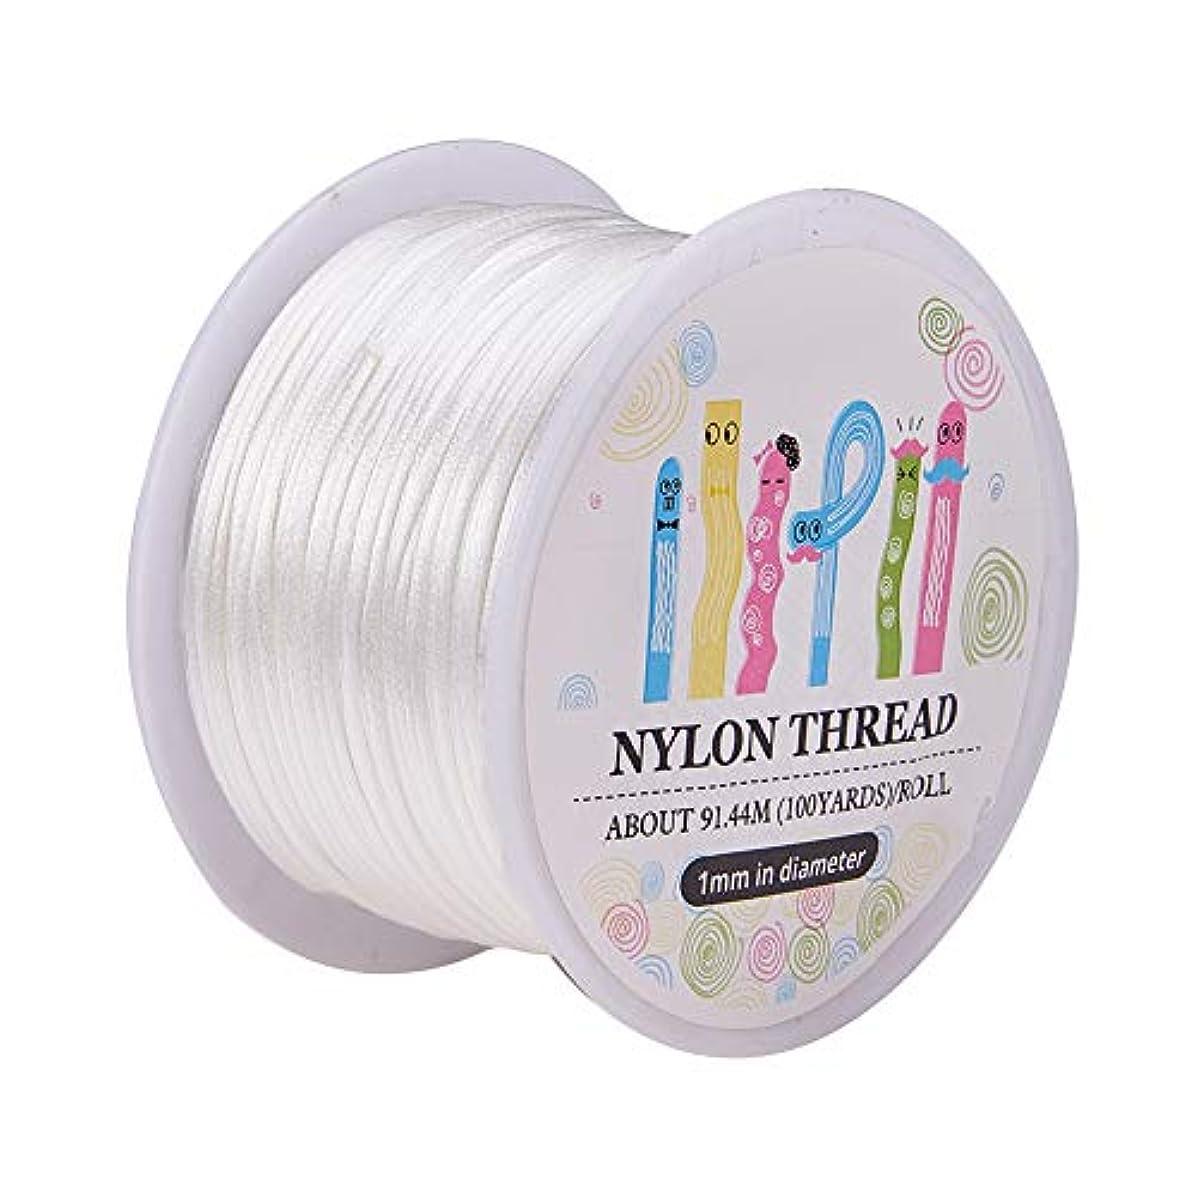 Pandahall 1 Roll 1mm x 100yards White Rattail Satin Nylon Trim Cord Chinese Knot